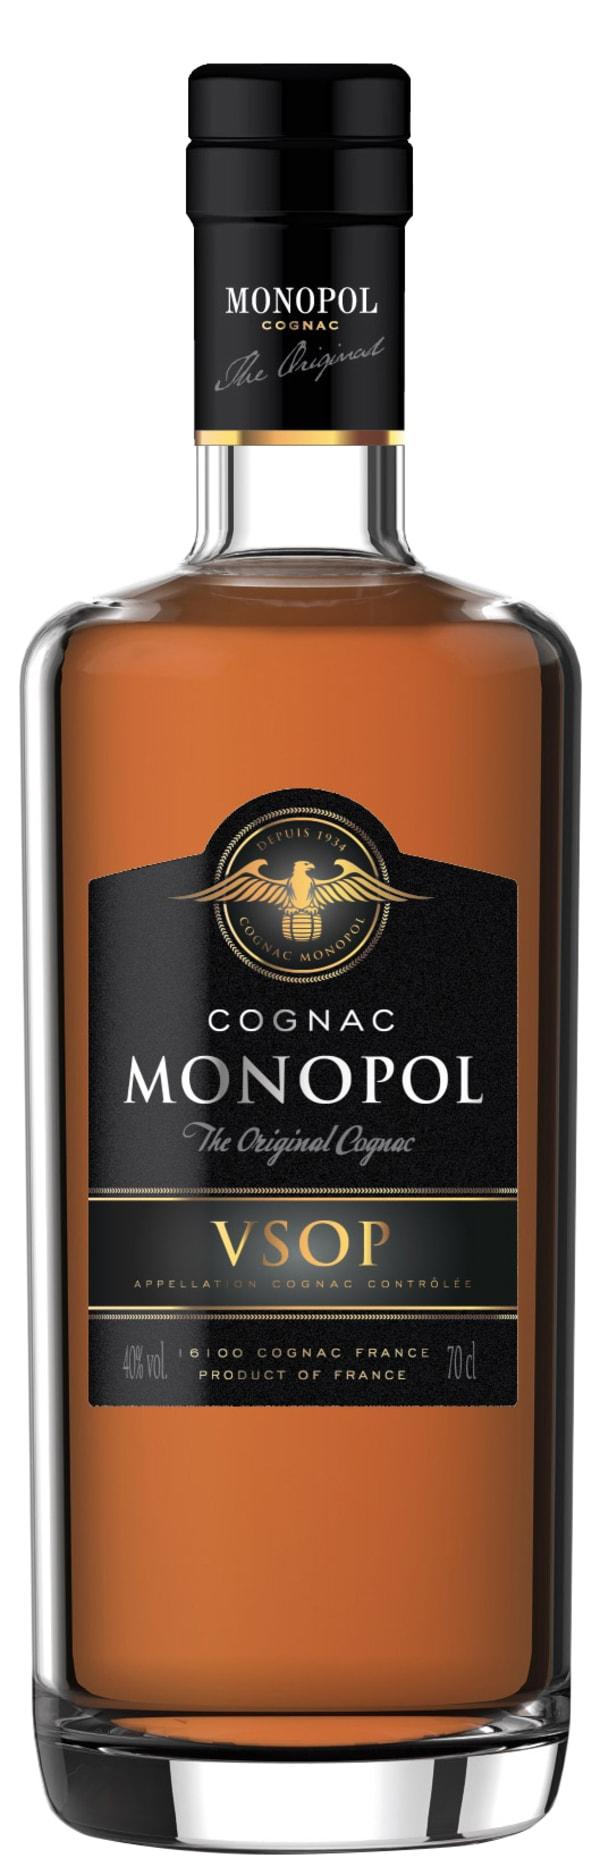 Monopol VSOP